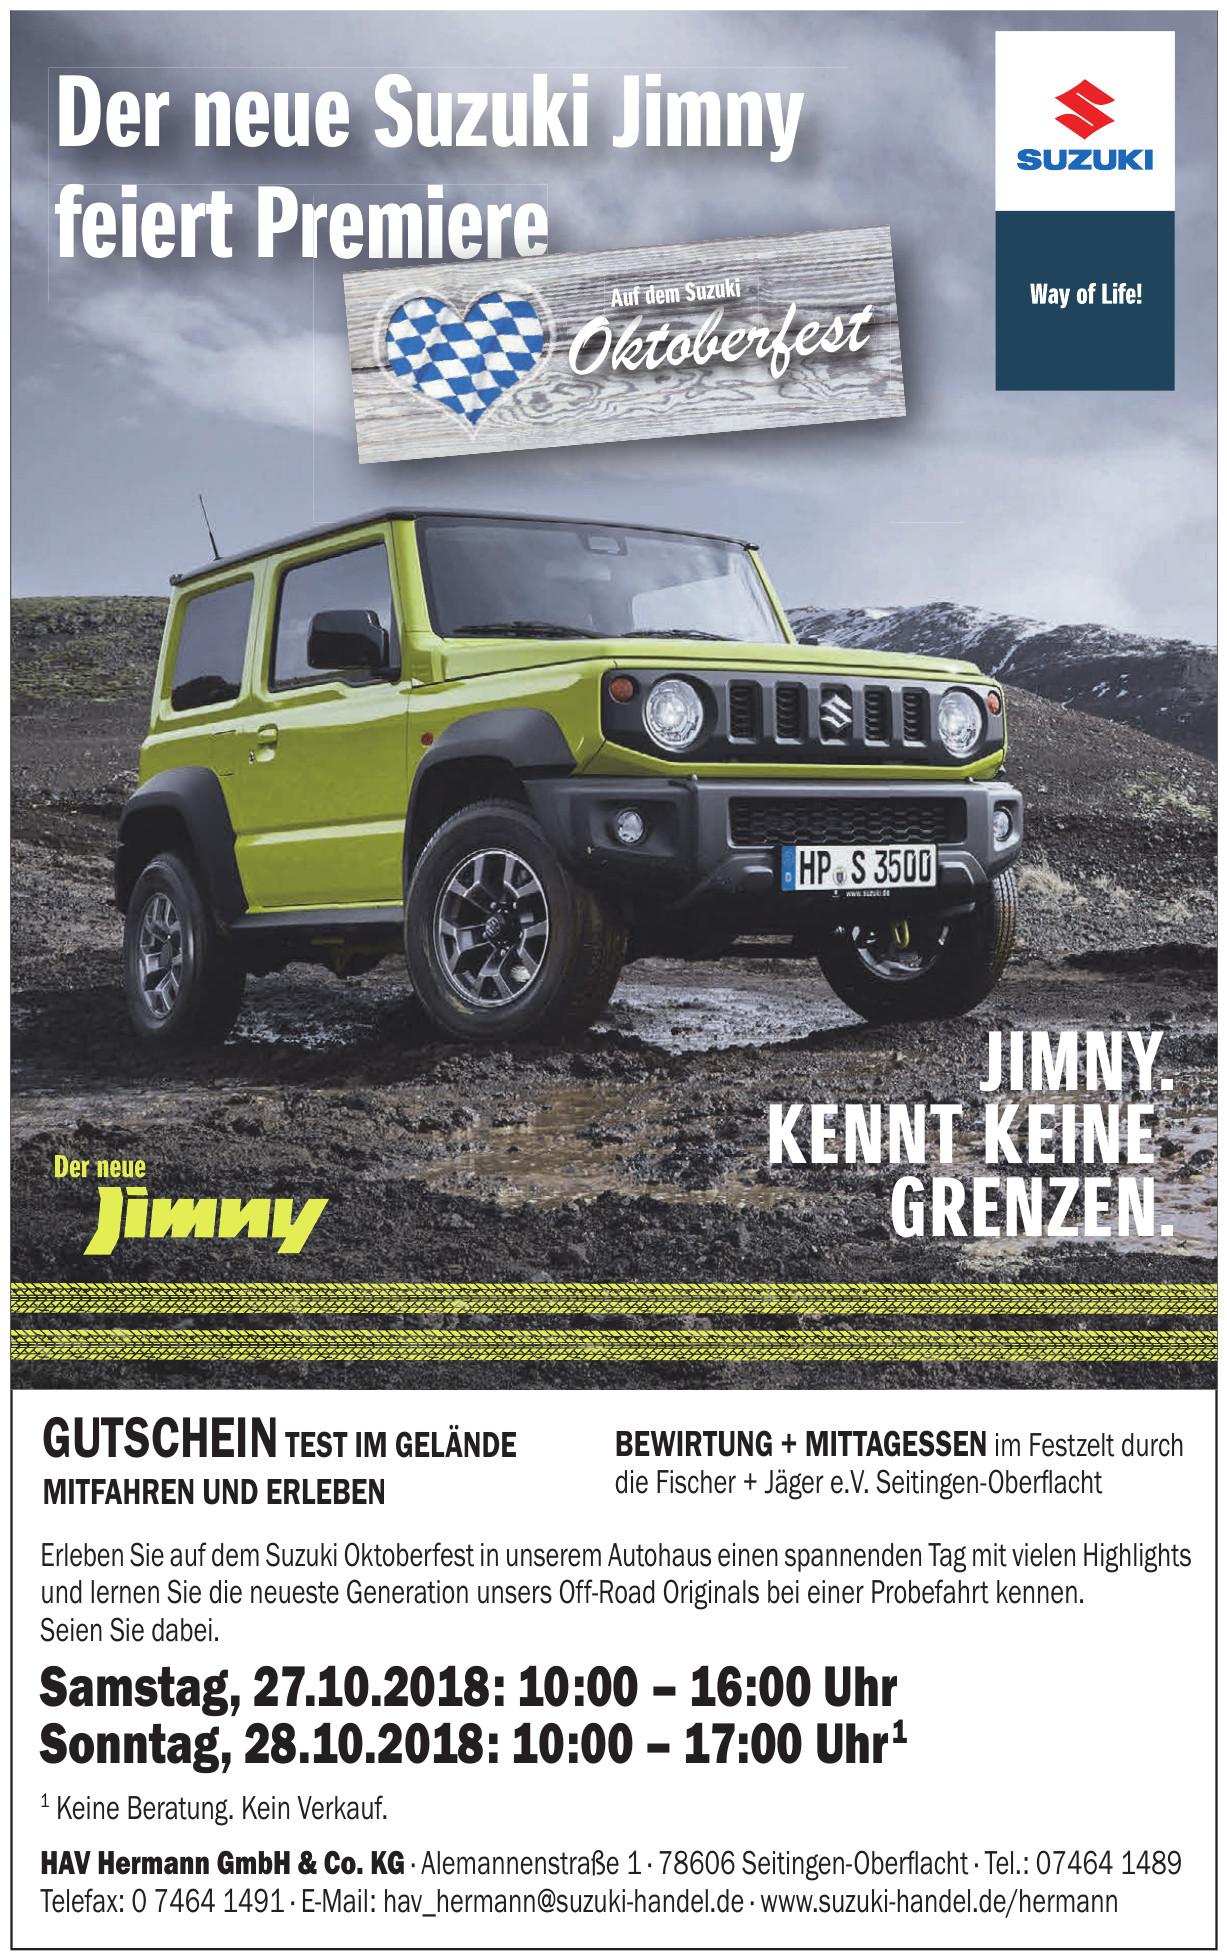 HAV Hermann GmbH & Co. KG